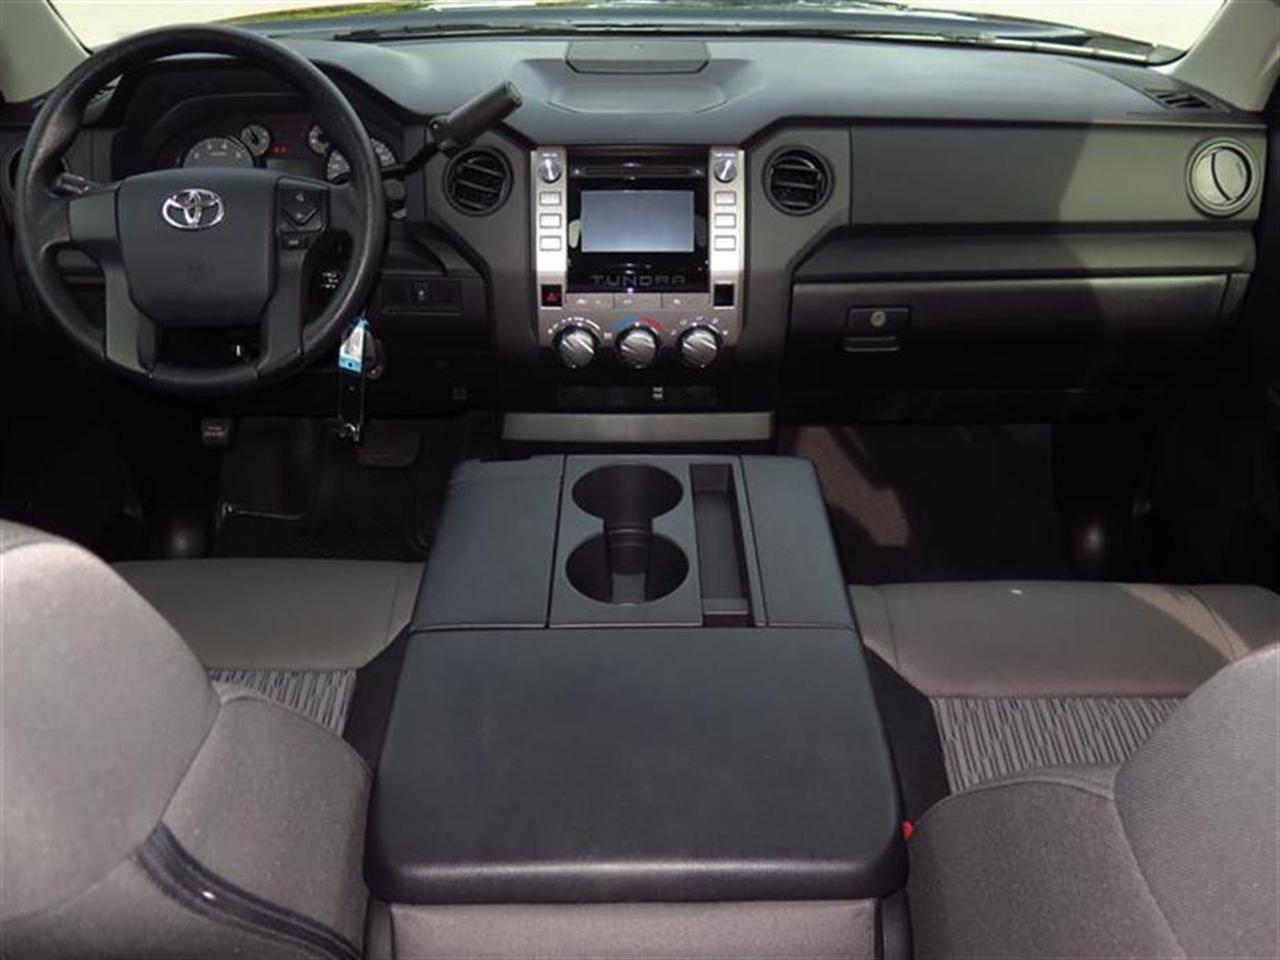 2014 TOYOTA TUNDRA 2WD TRUCK Double Cab 46L V8 6-Spd AT SR 6946 miles 1 Seatback Storage Pocket